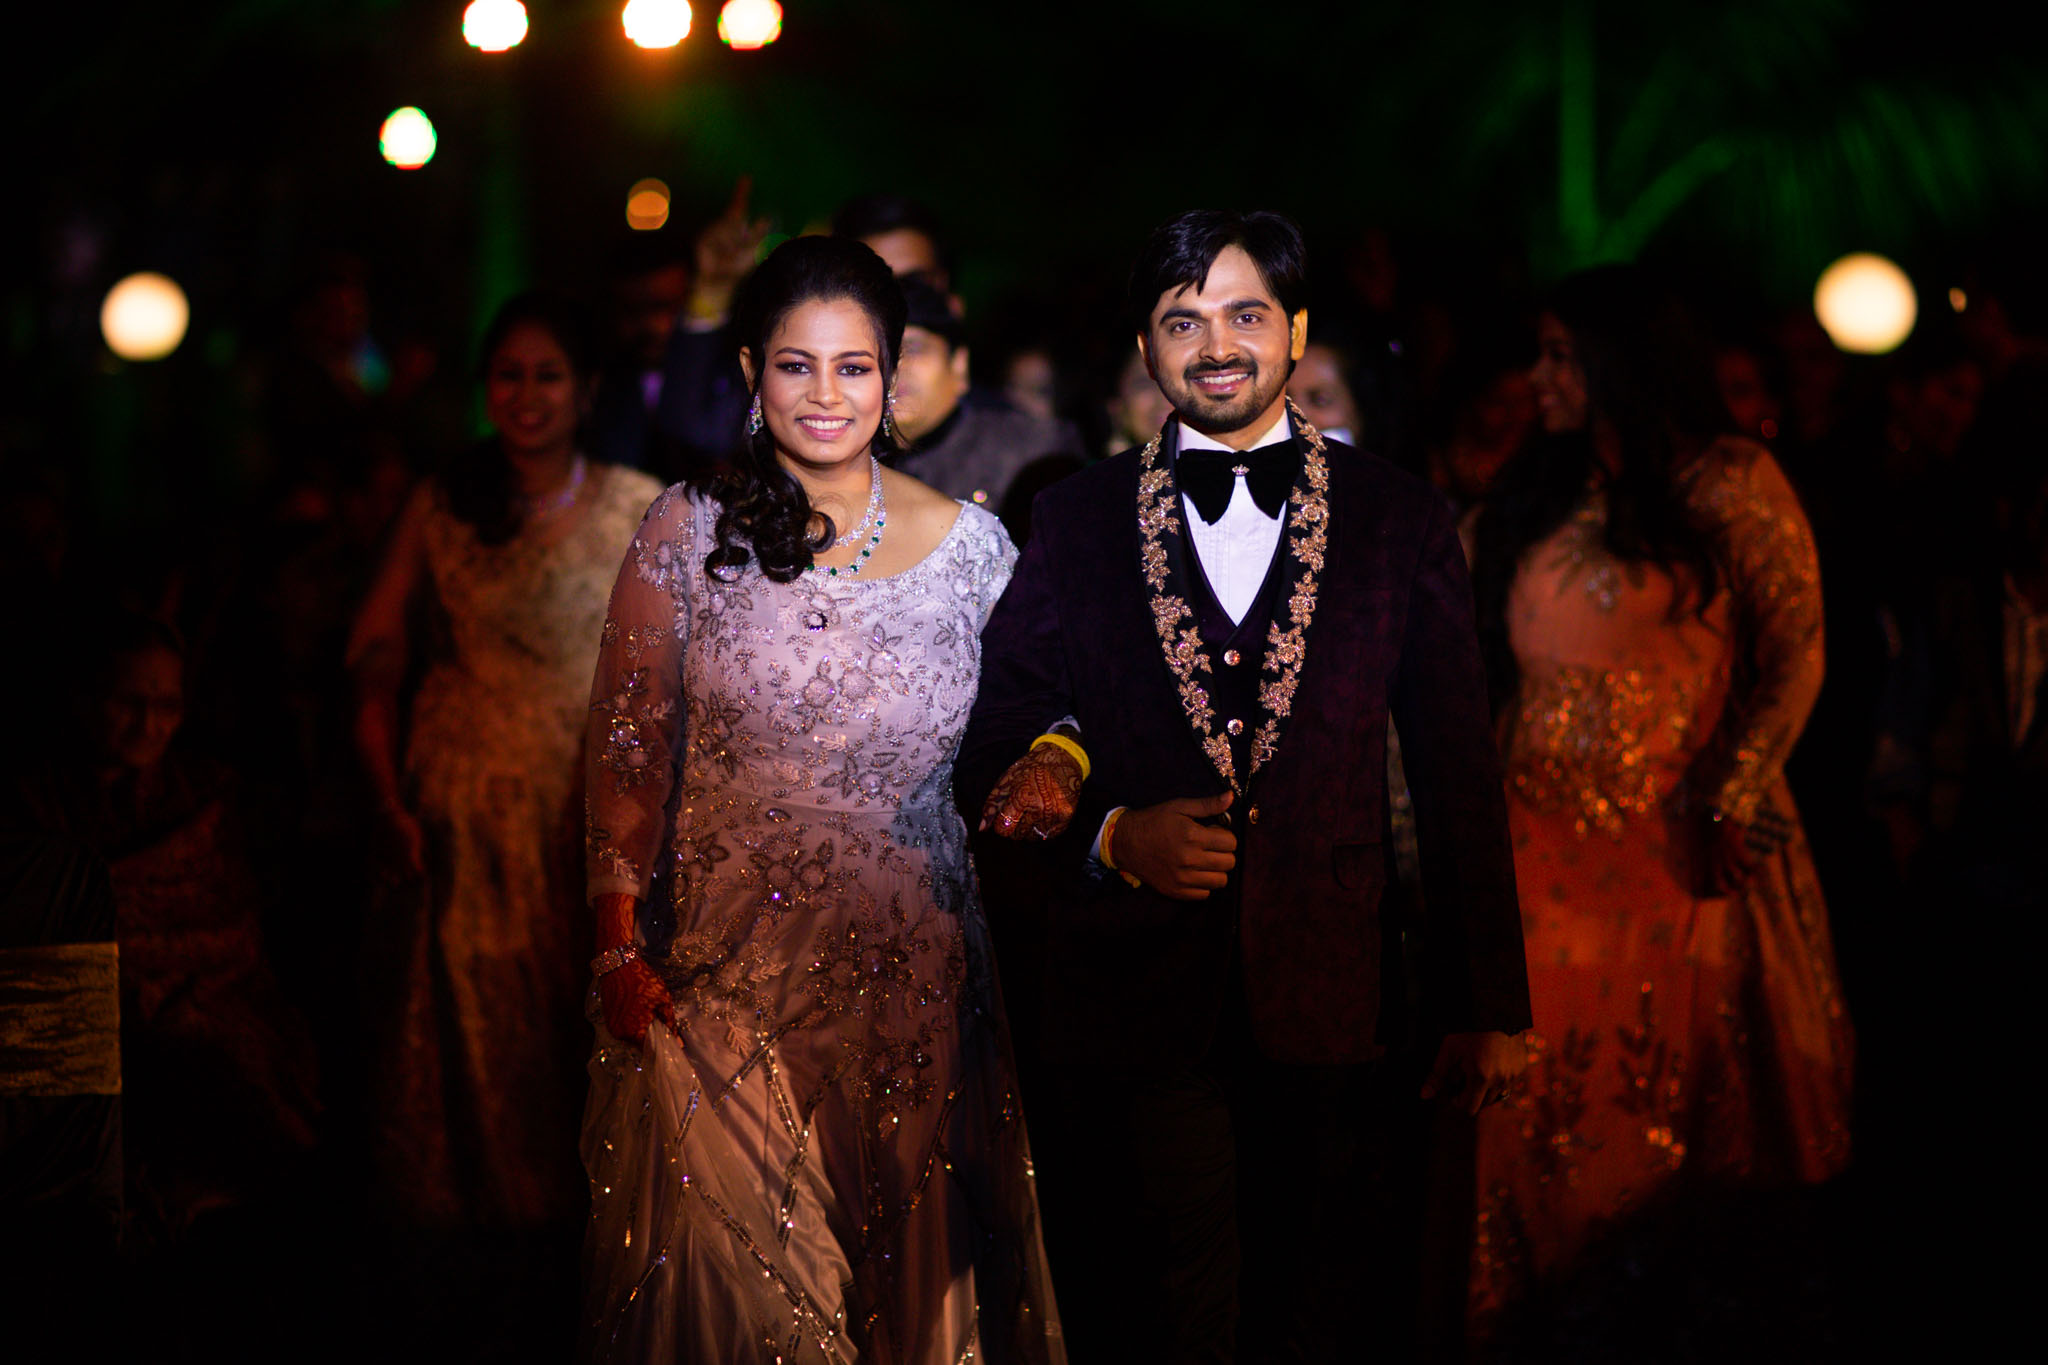 Mukti x Ojas Wedding Akshjay Sansare Photography Best wedding photographer in mumbai India Candid Cinematic Films videos-17.jpg